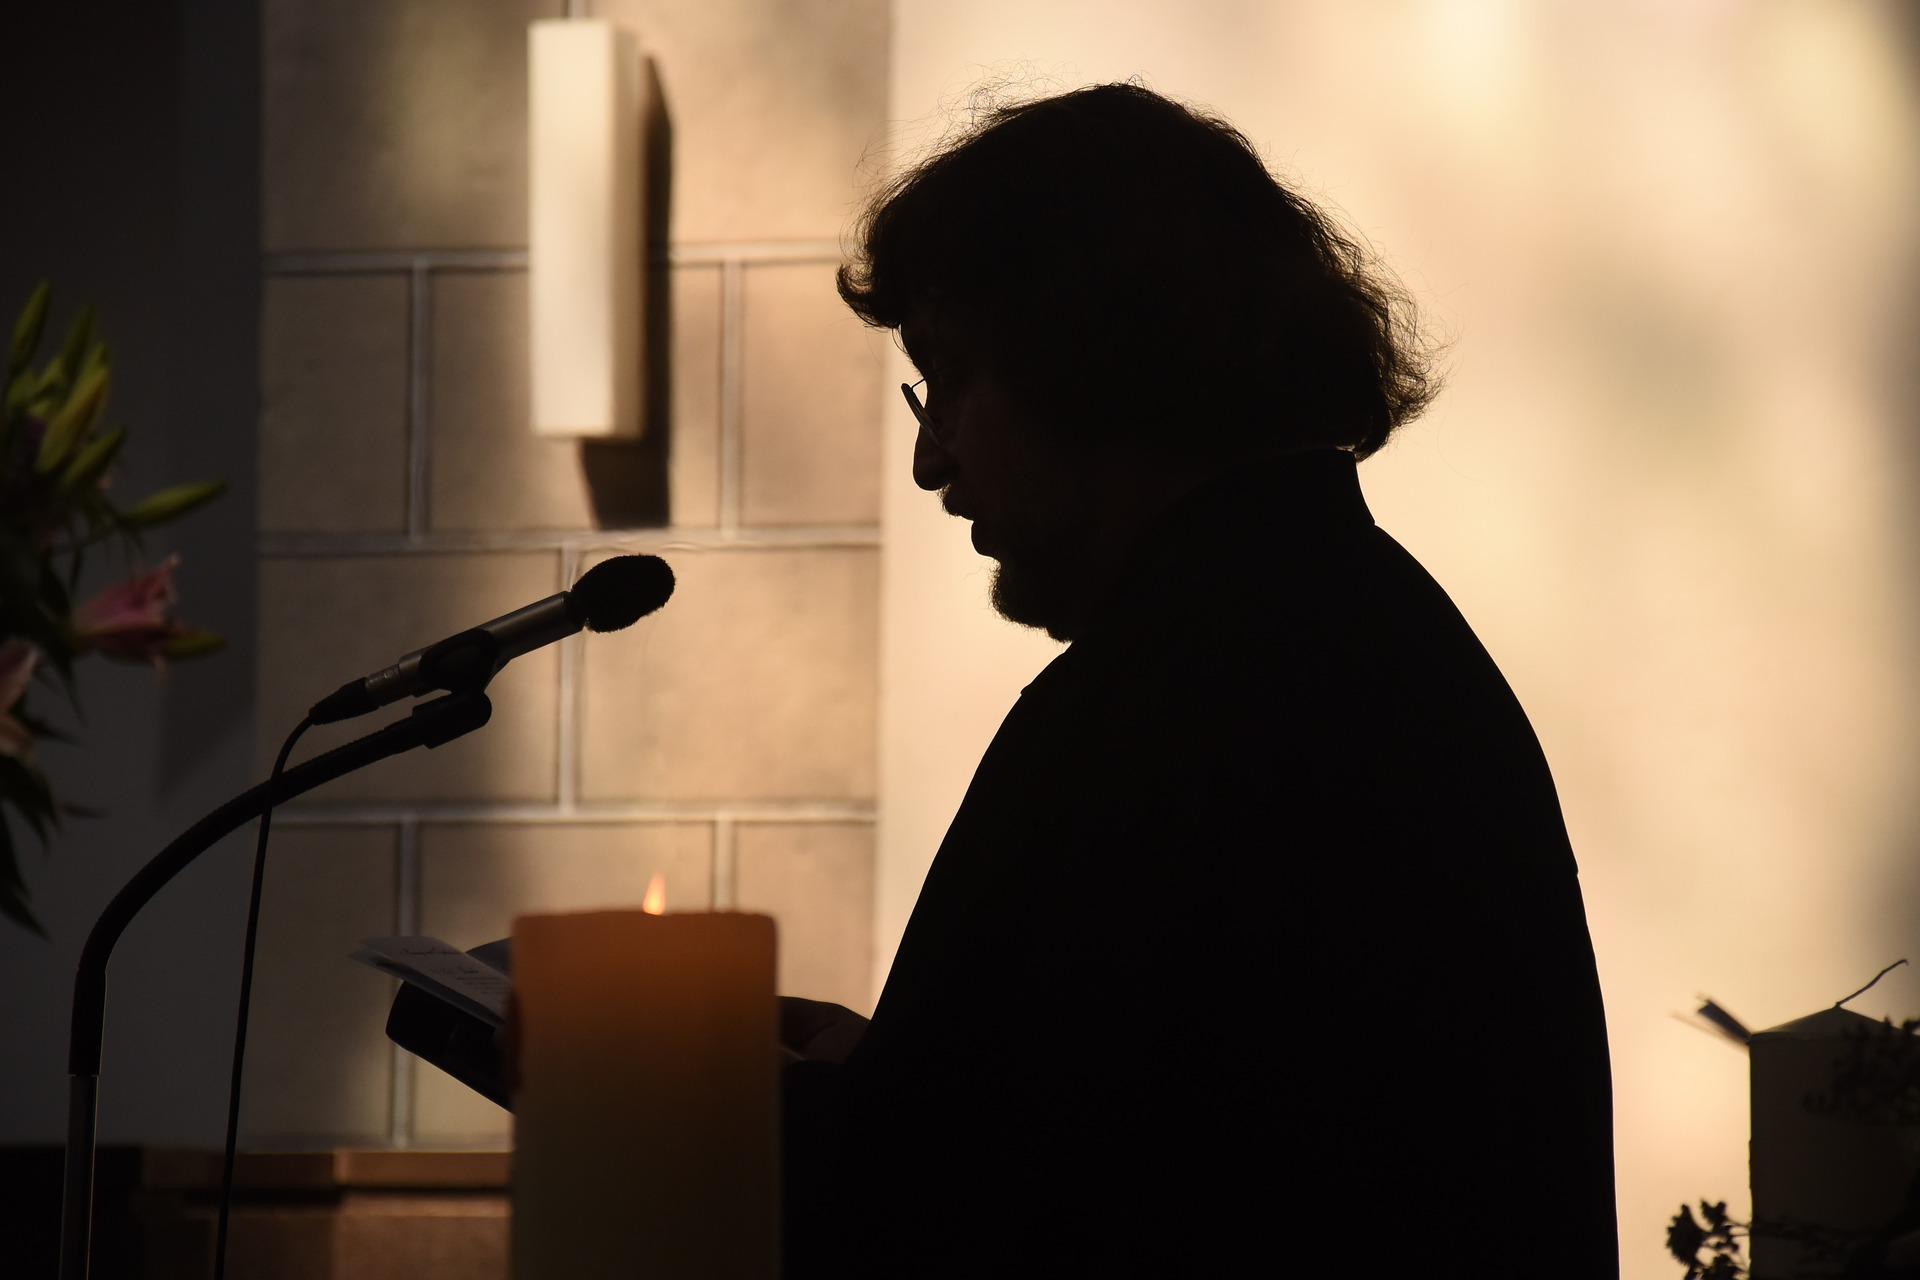 pastor silhouette.jpg